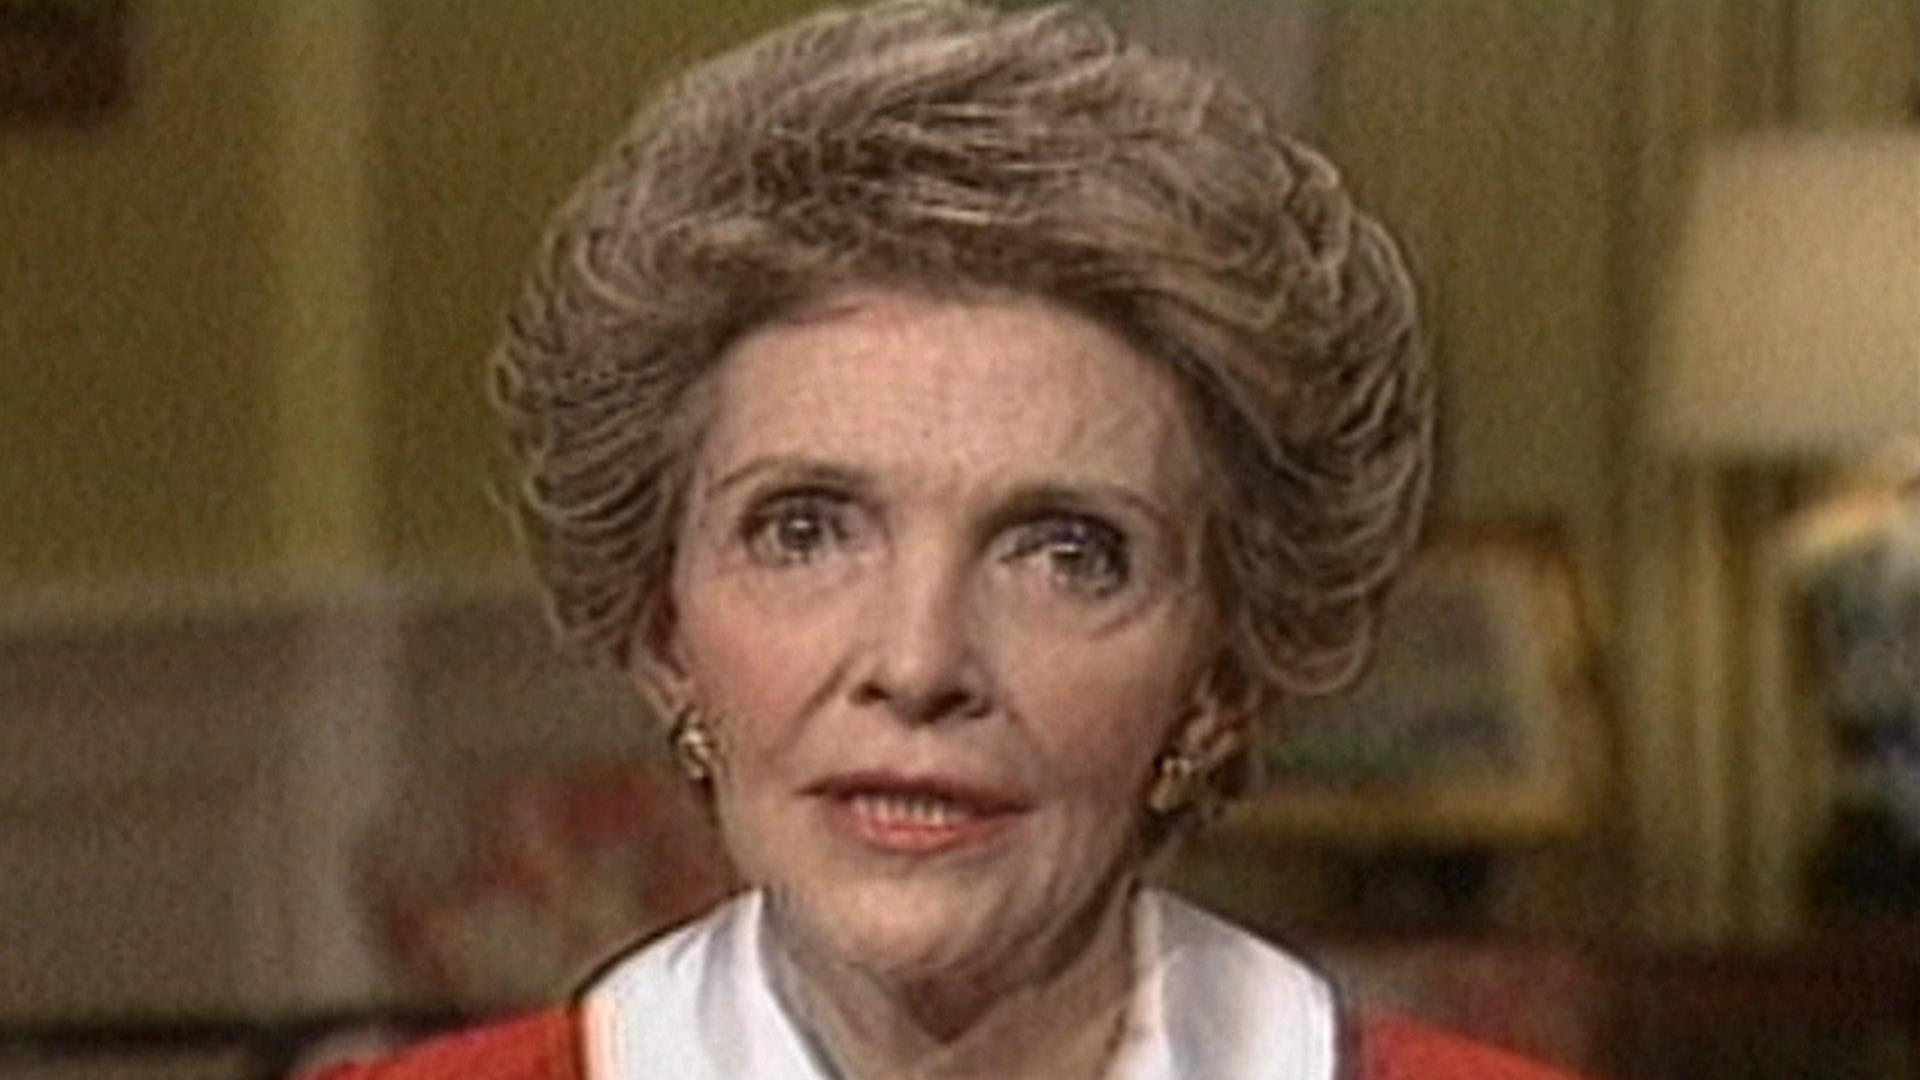 Tracing Nancy Reagan's Rise from Hollywood to Washington